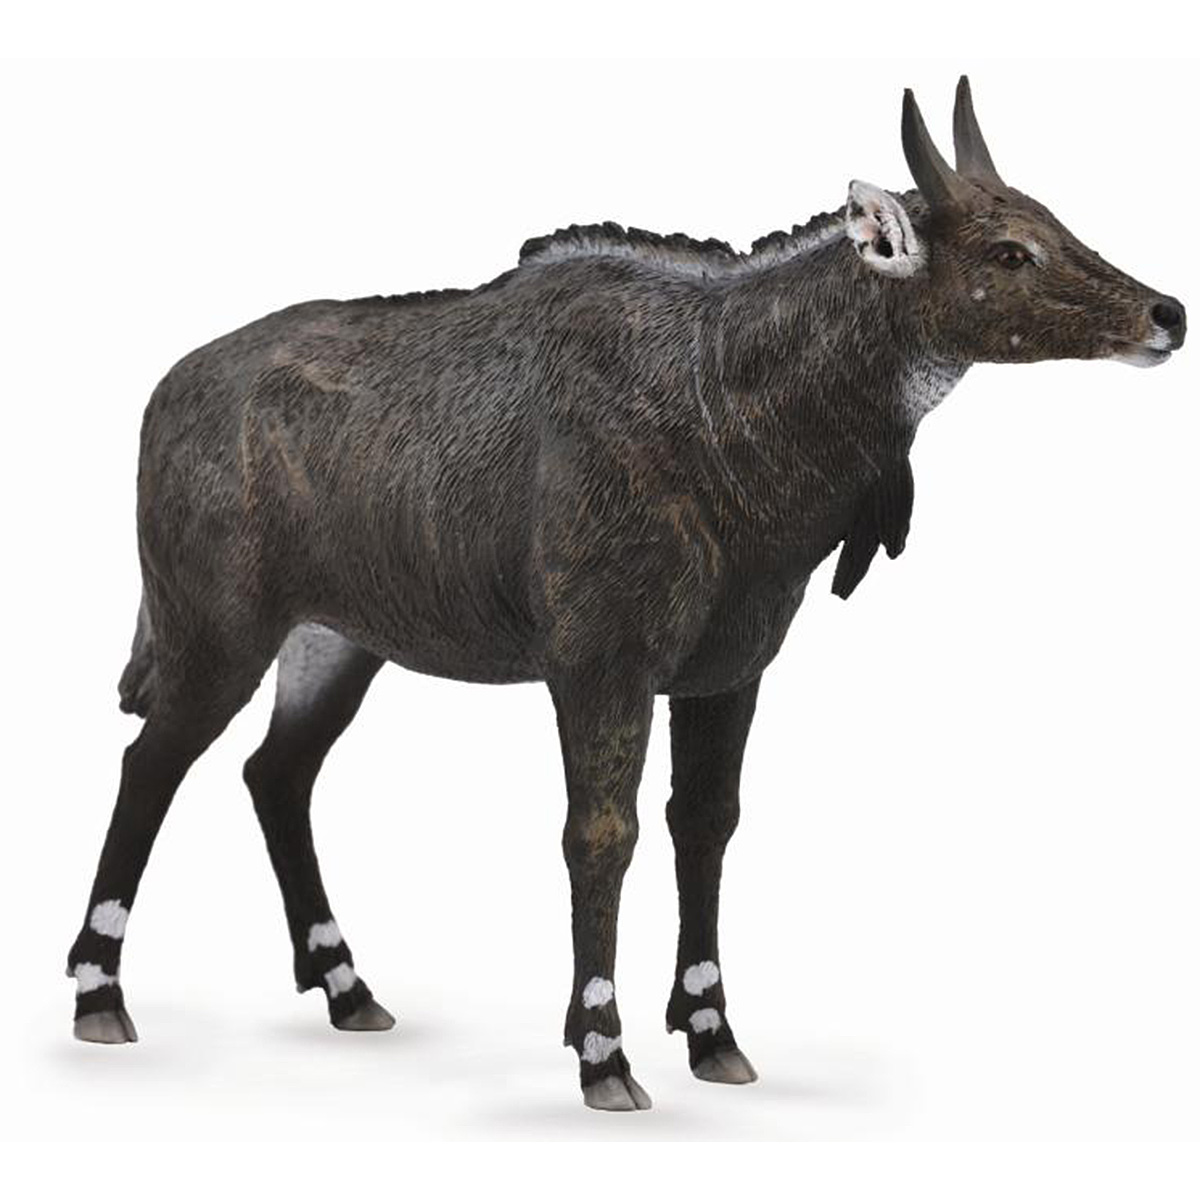 Фигурка животного - Антилопа нильгау, размер MДикая природа (Wildlife)<br>Фигурка животного - Антилопа нильгау, размер M<br>